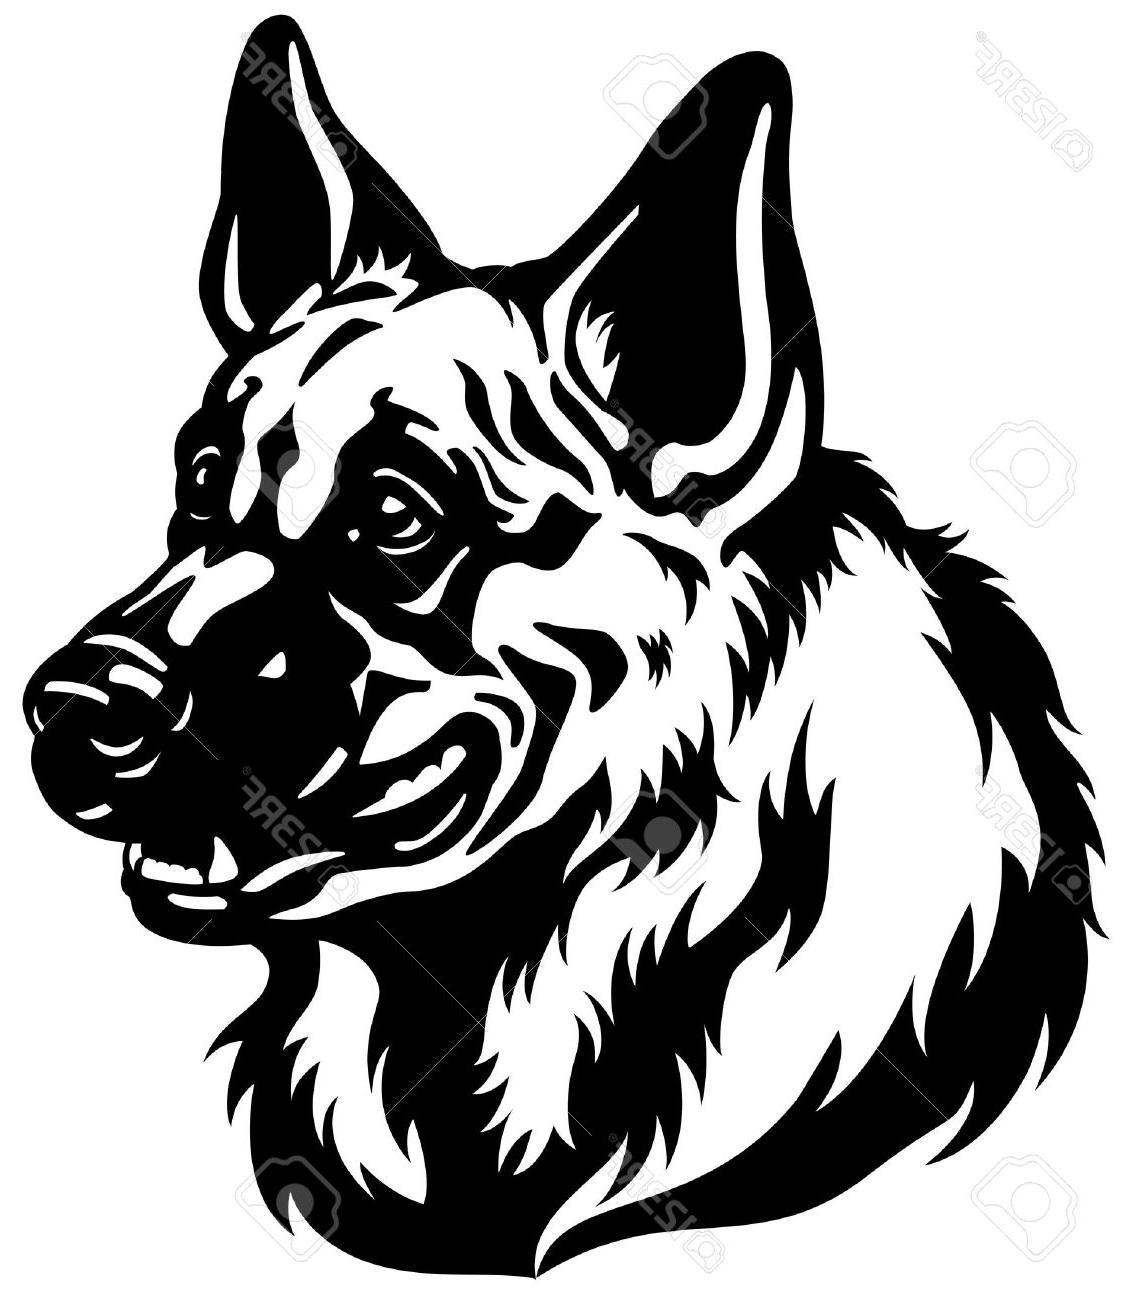 1131x1300 Hd German Shepherd Dog Head Black And White Illustration Stock